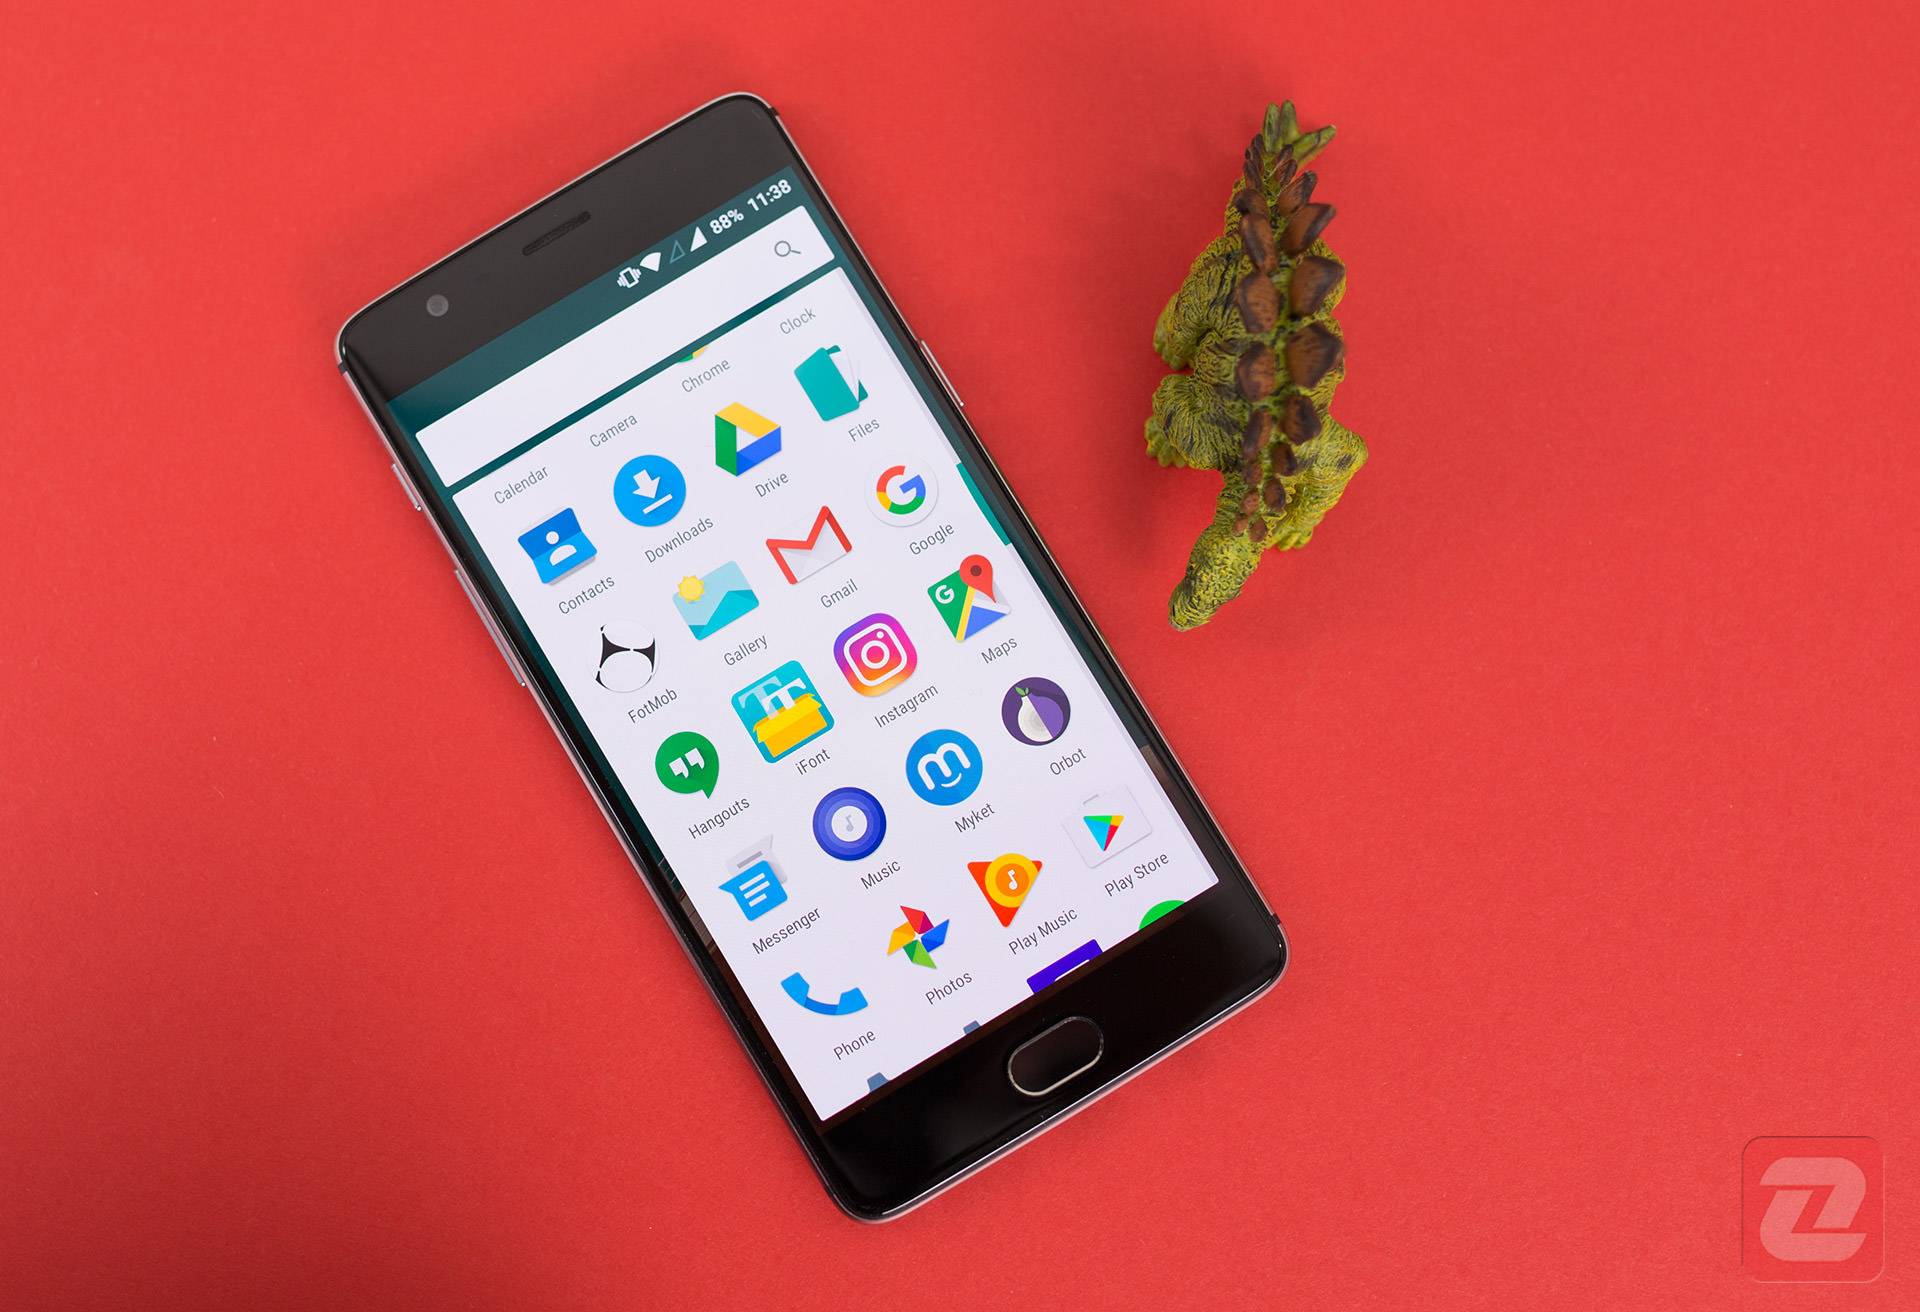 OnePlus 3- Display